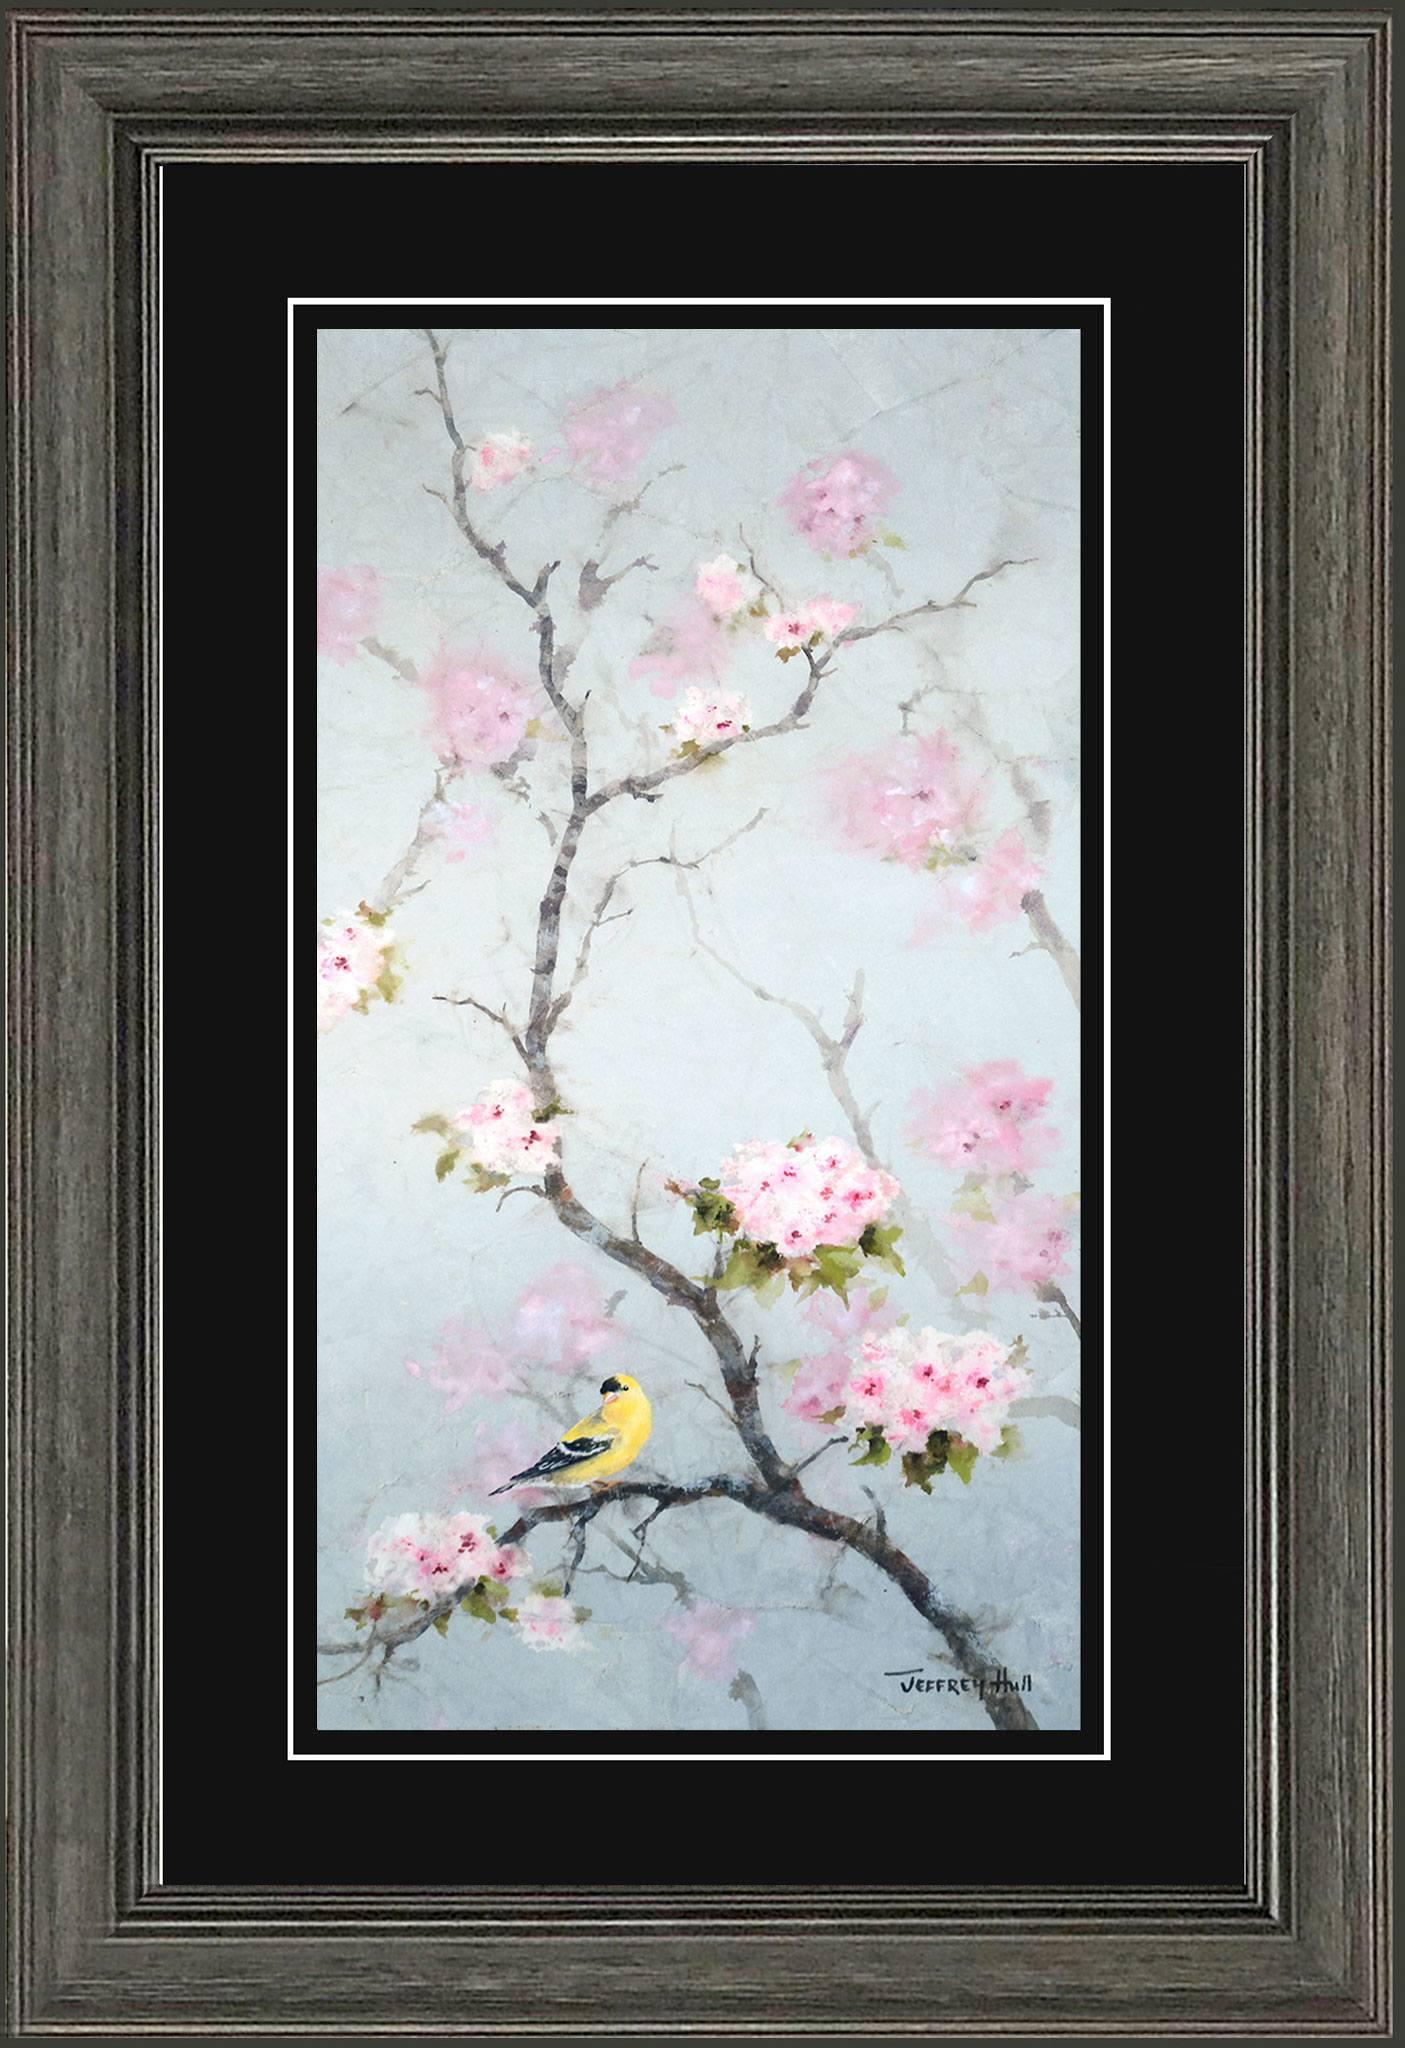 Goldfinch-_-Cherry-Blossoms-OpenEd-Cascade-Jet-Black-4-Website-2021